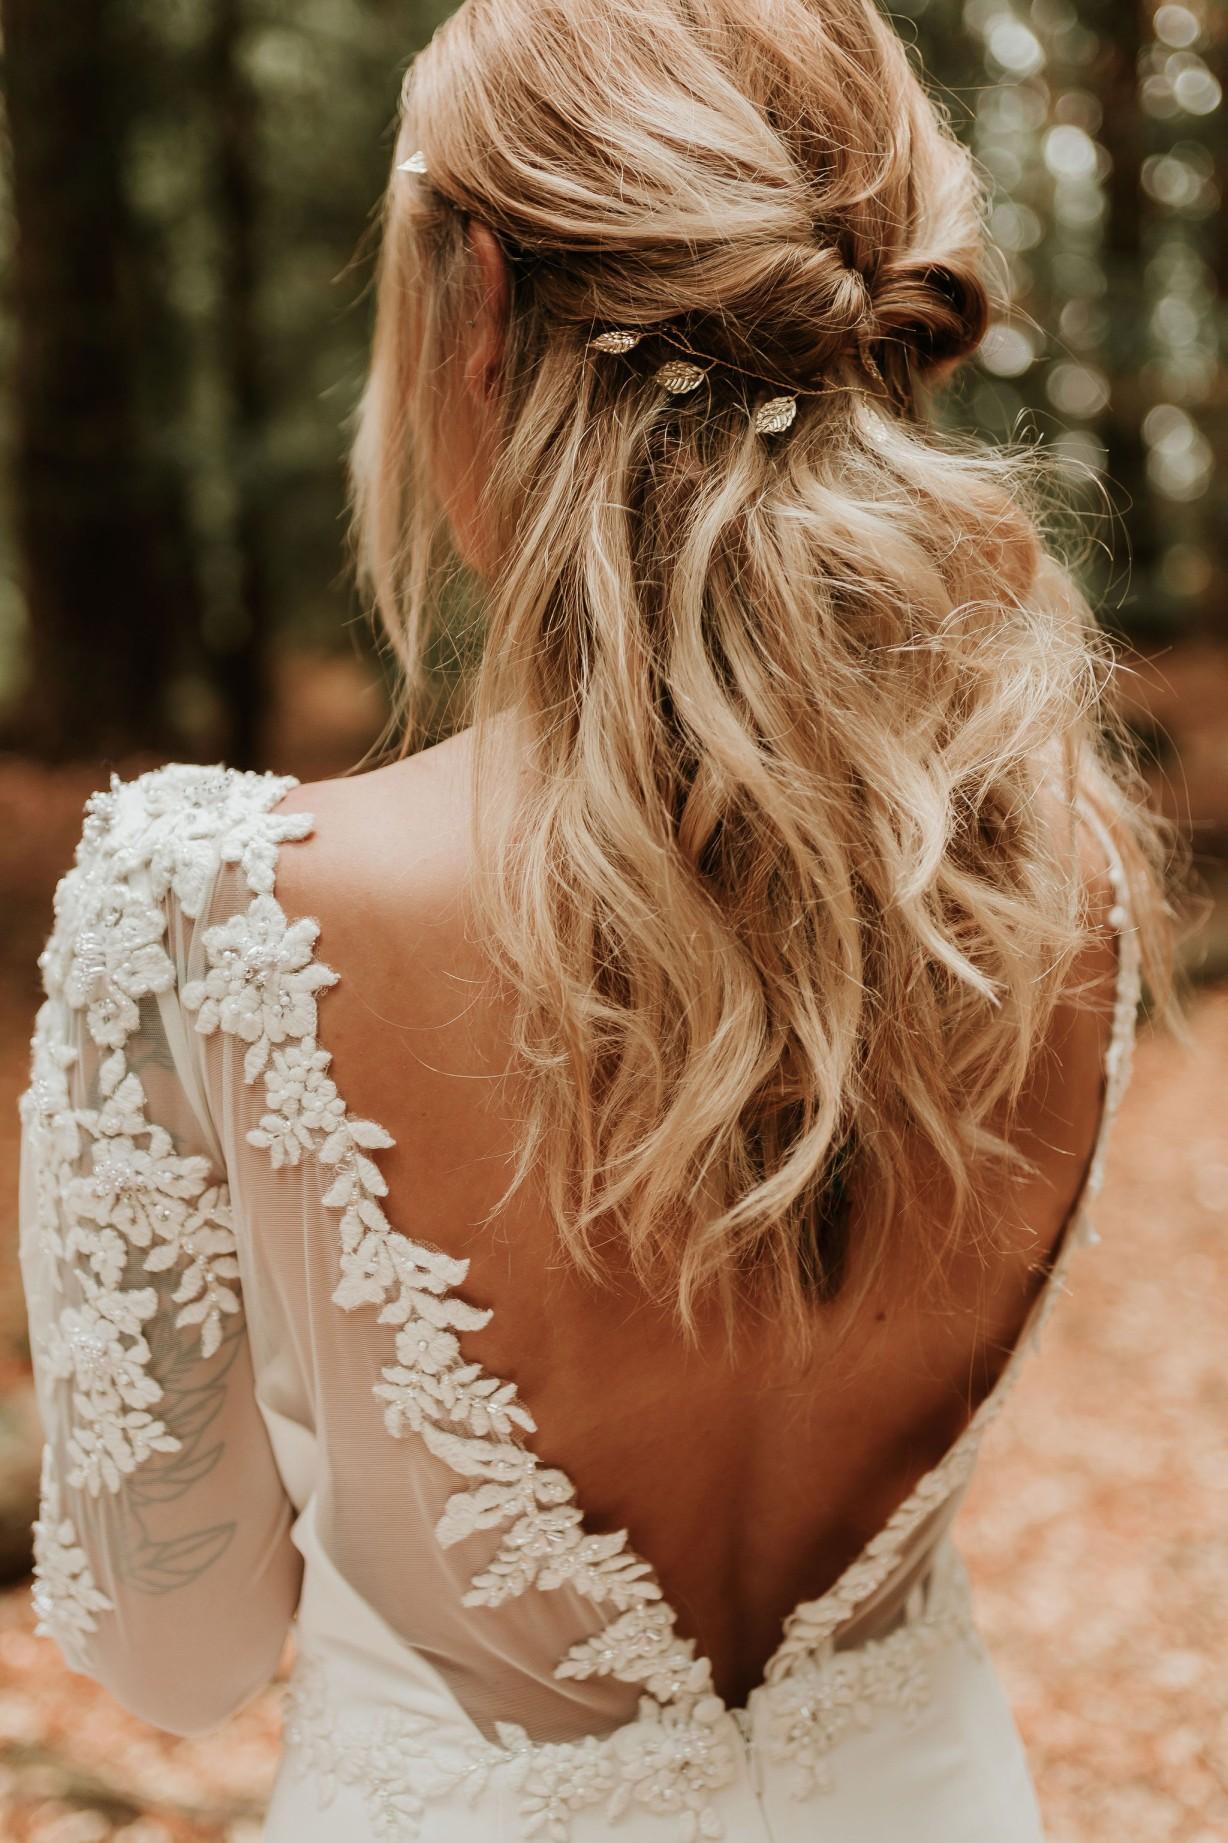 elegant wedding hair accessories - boho wedding hair